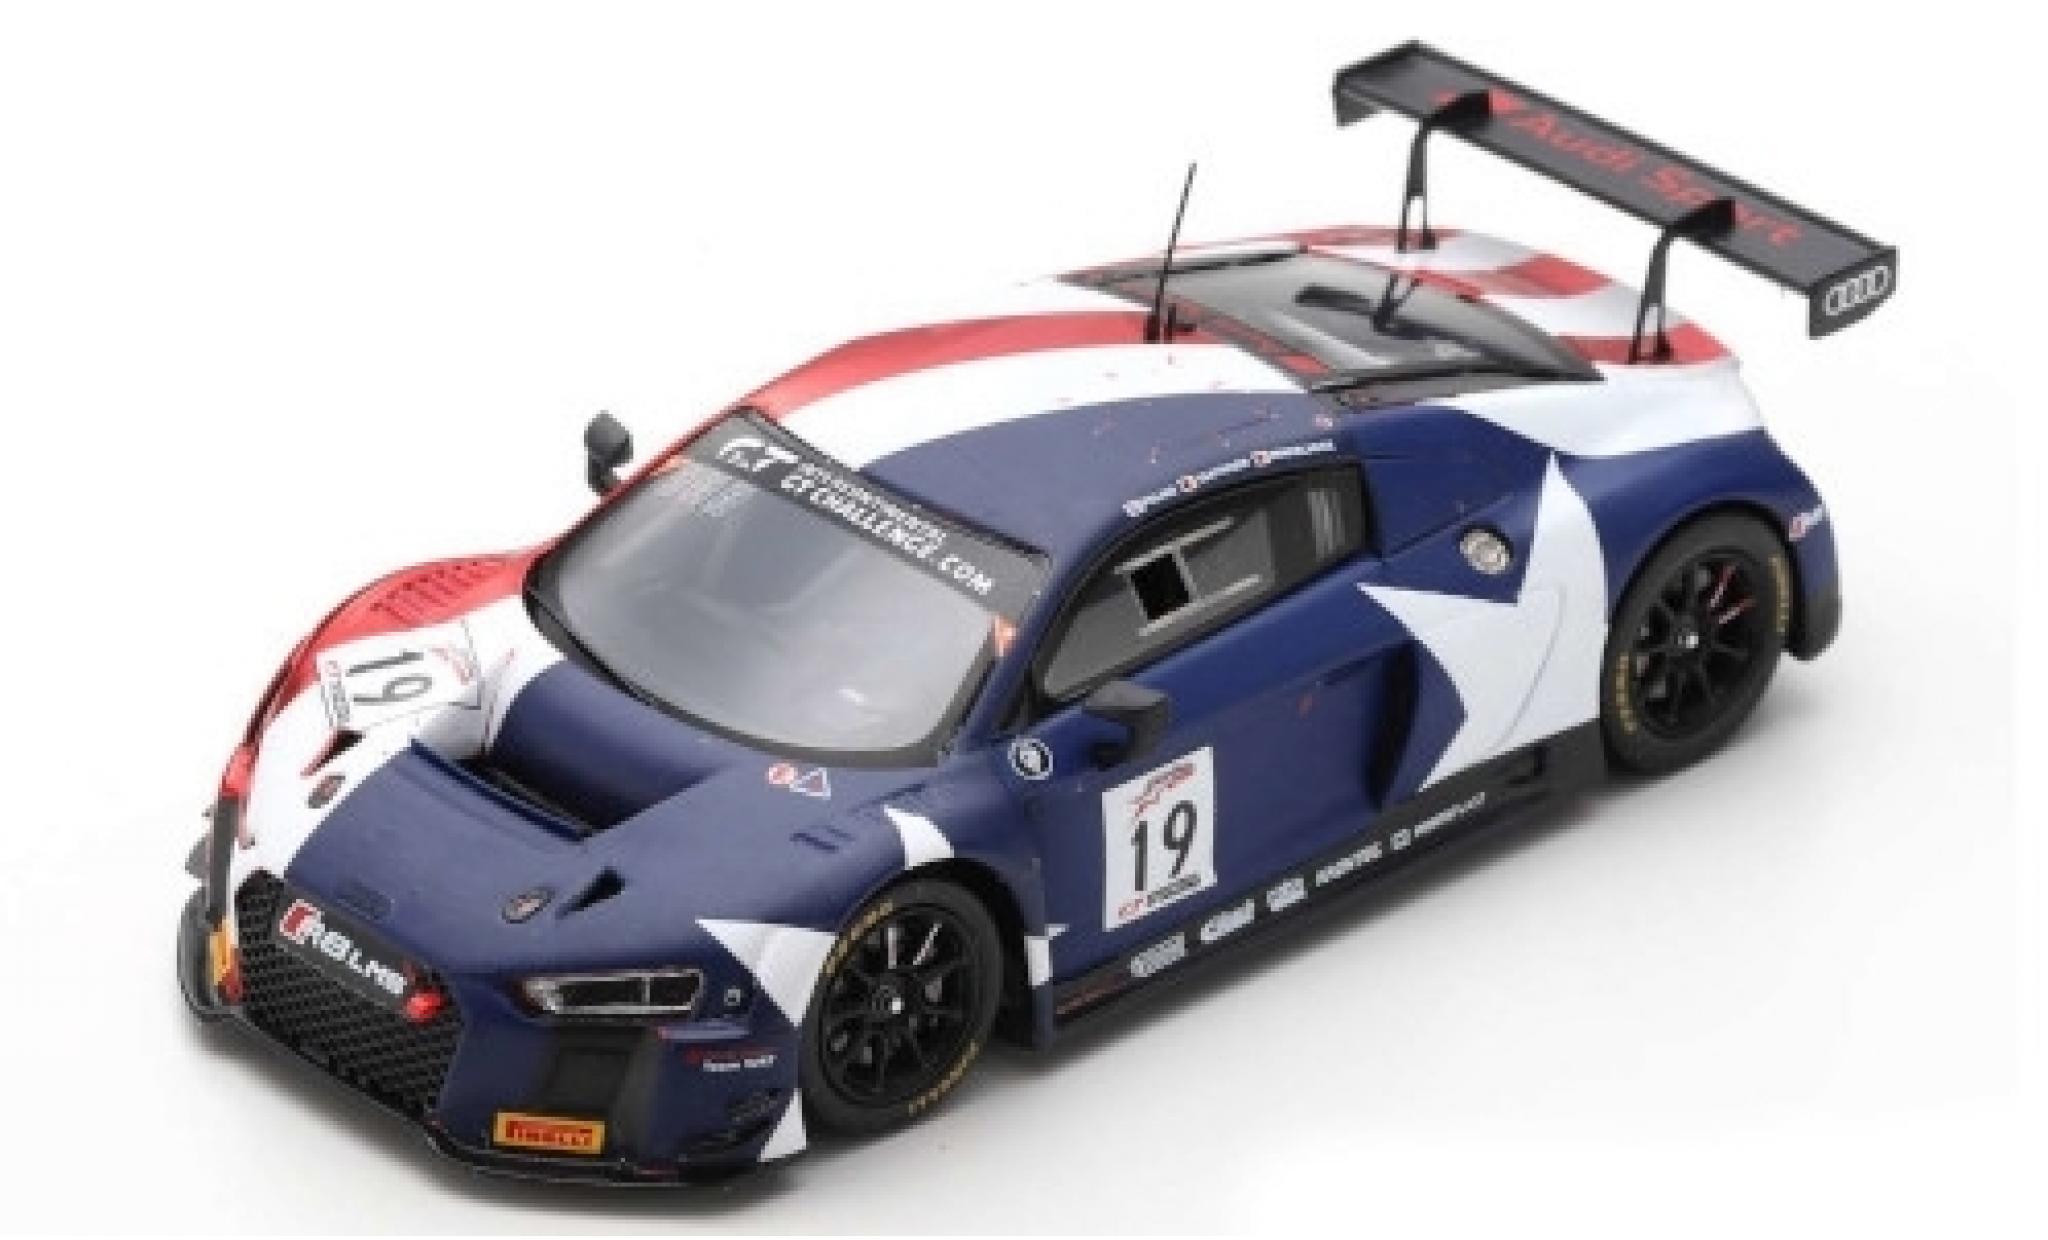 Audi R8 1/43 Spark LMS No.19 Sport Team WRT Intercontinental GT Challenge 8h Kalifornien 2018 R.Frijns/D.Vanthoor/M.Winkelhock